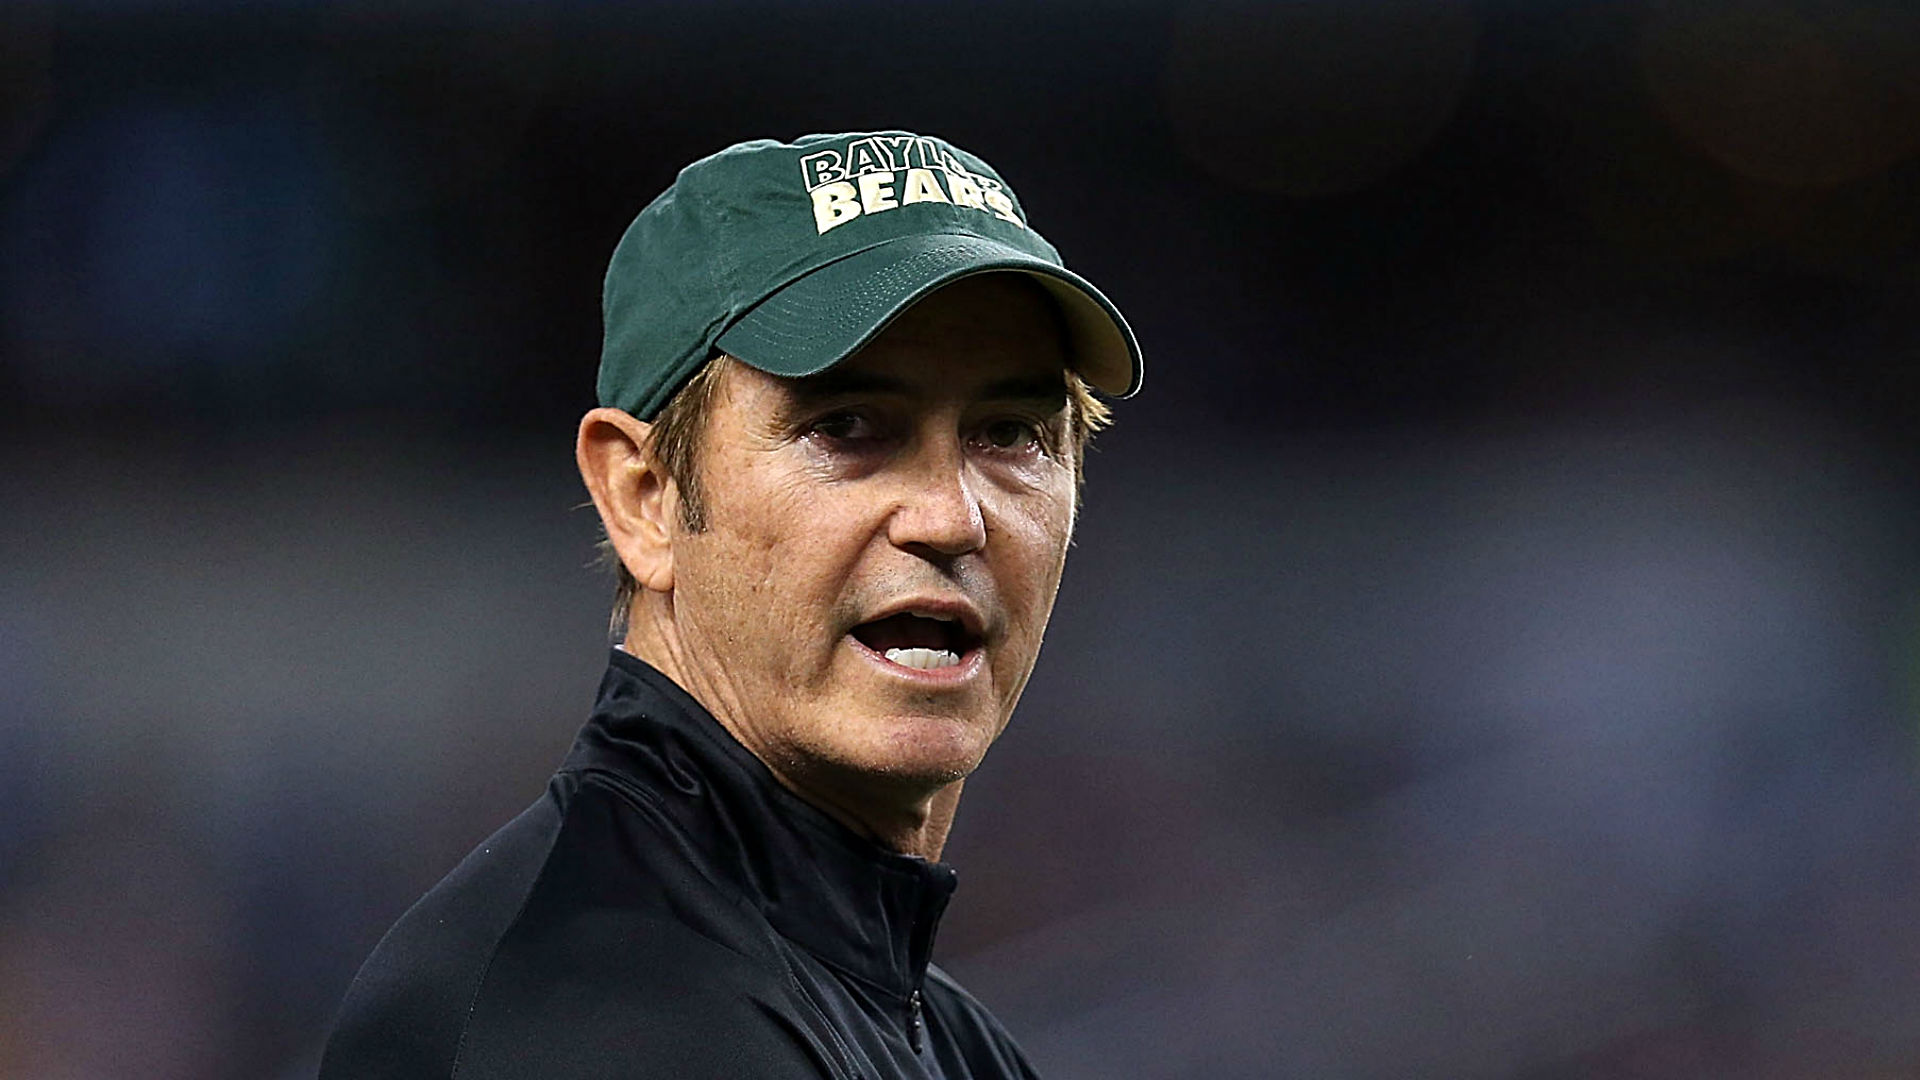 Baylor head coach Art Briles